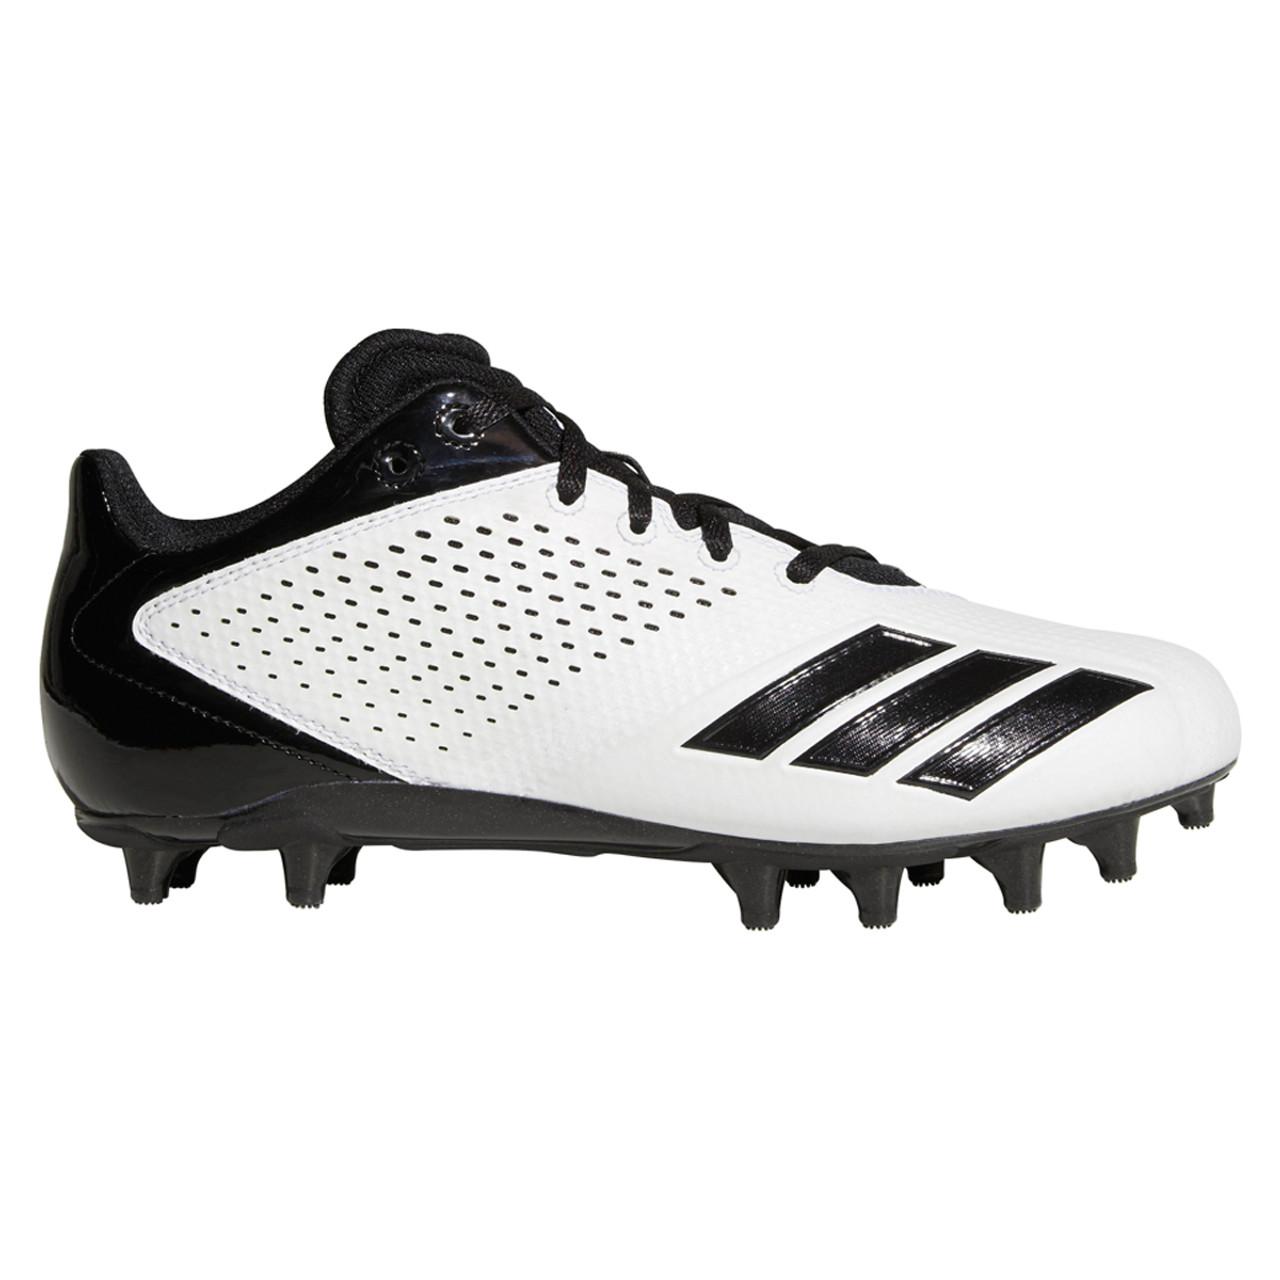 Football Cleats | Adidas 5-Star